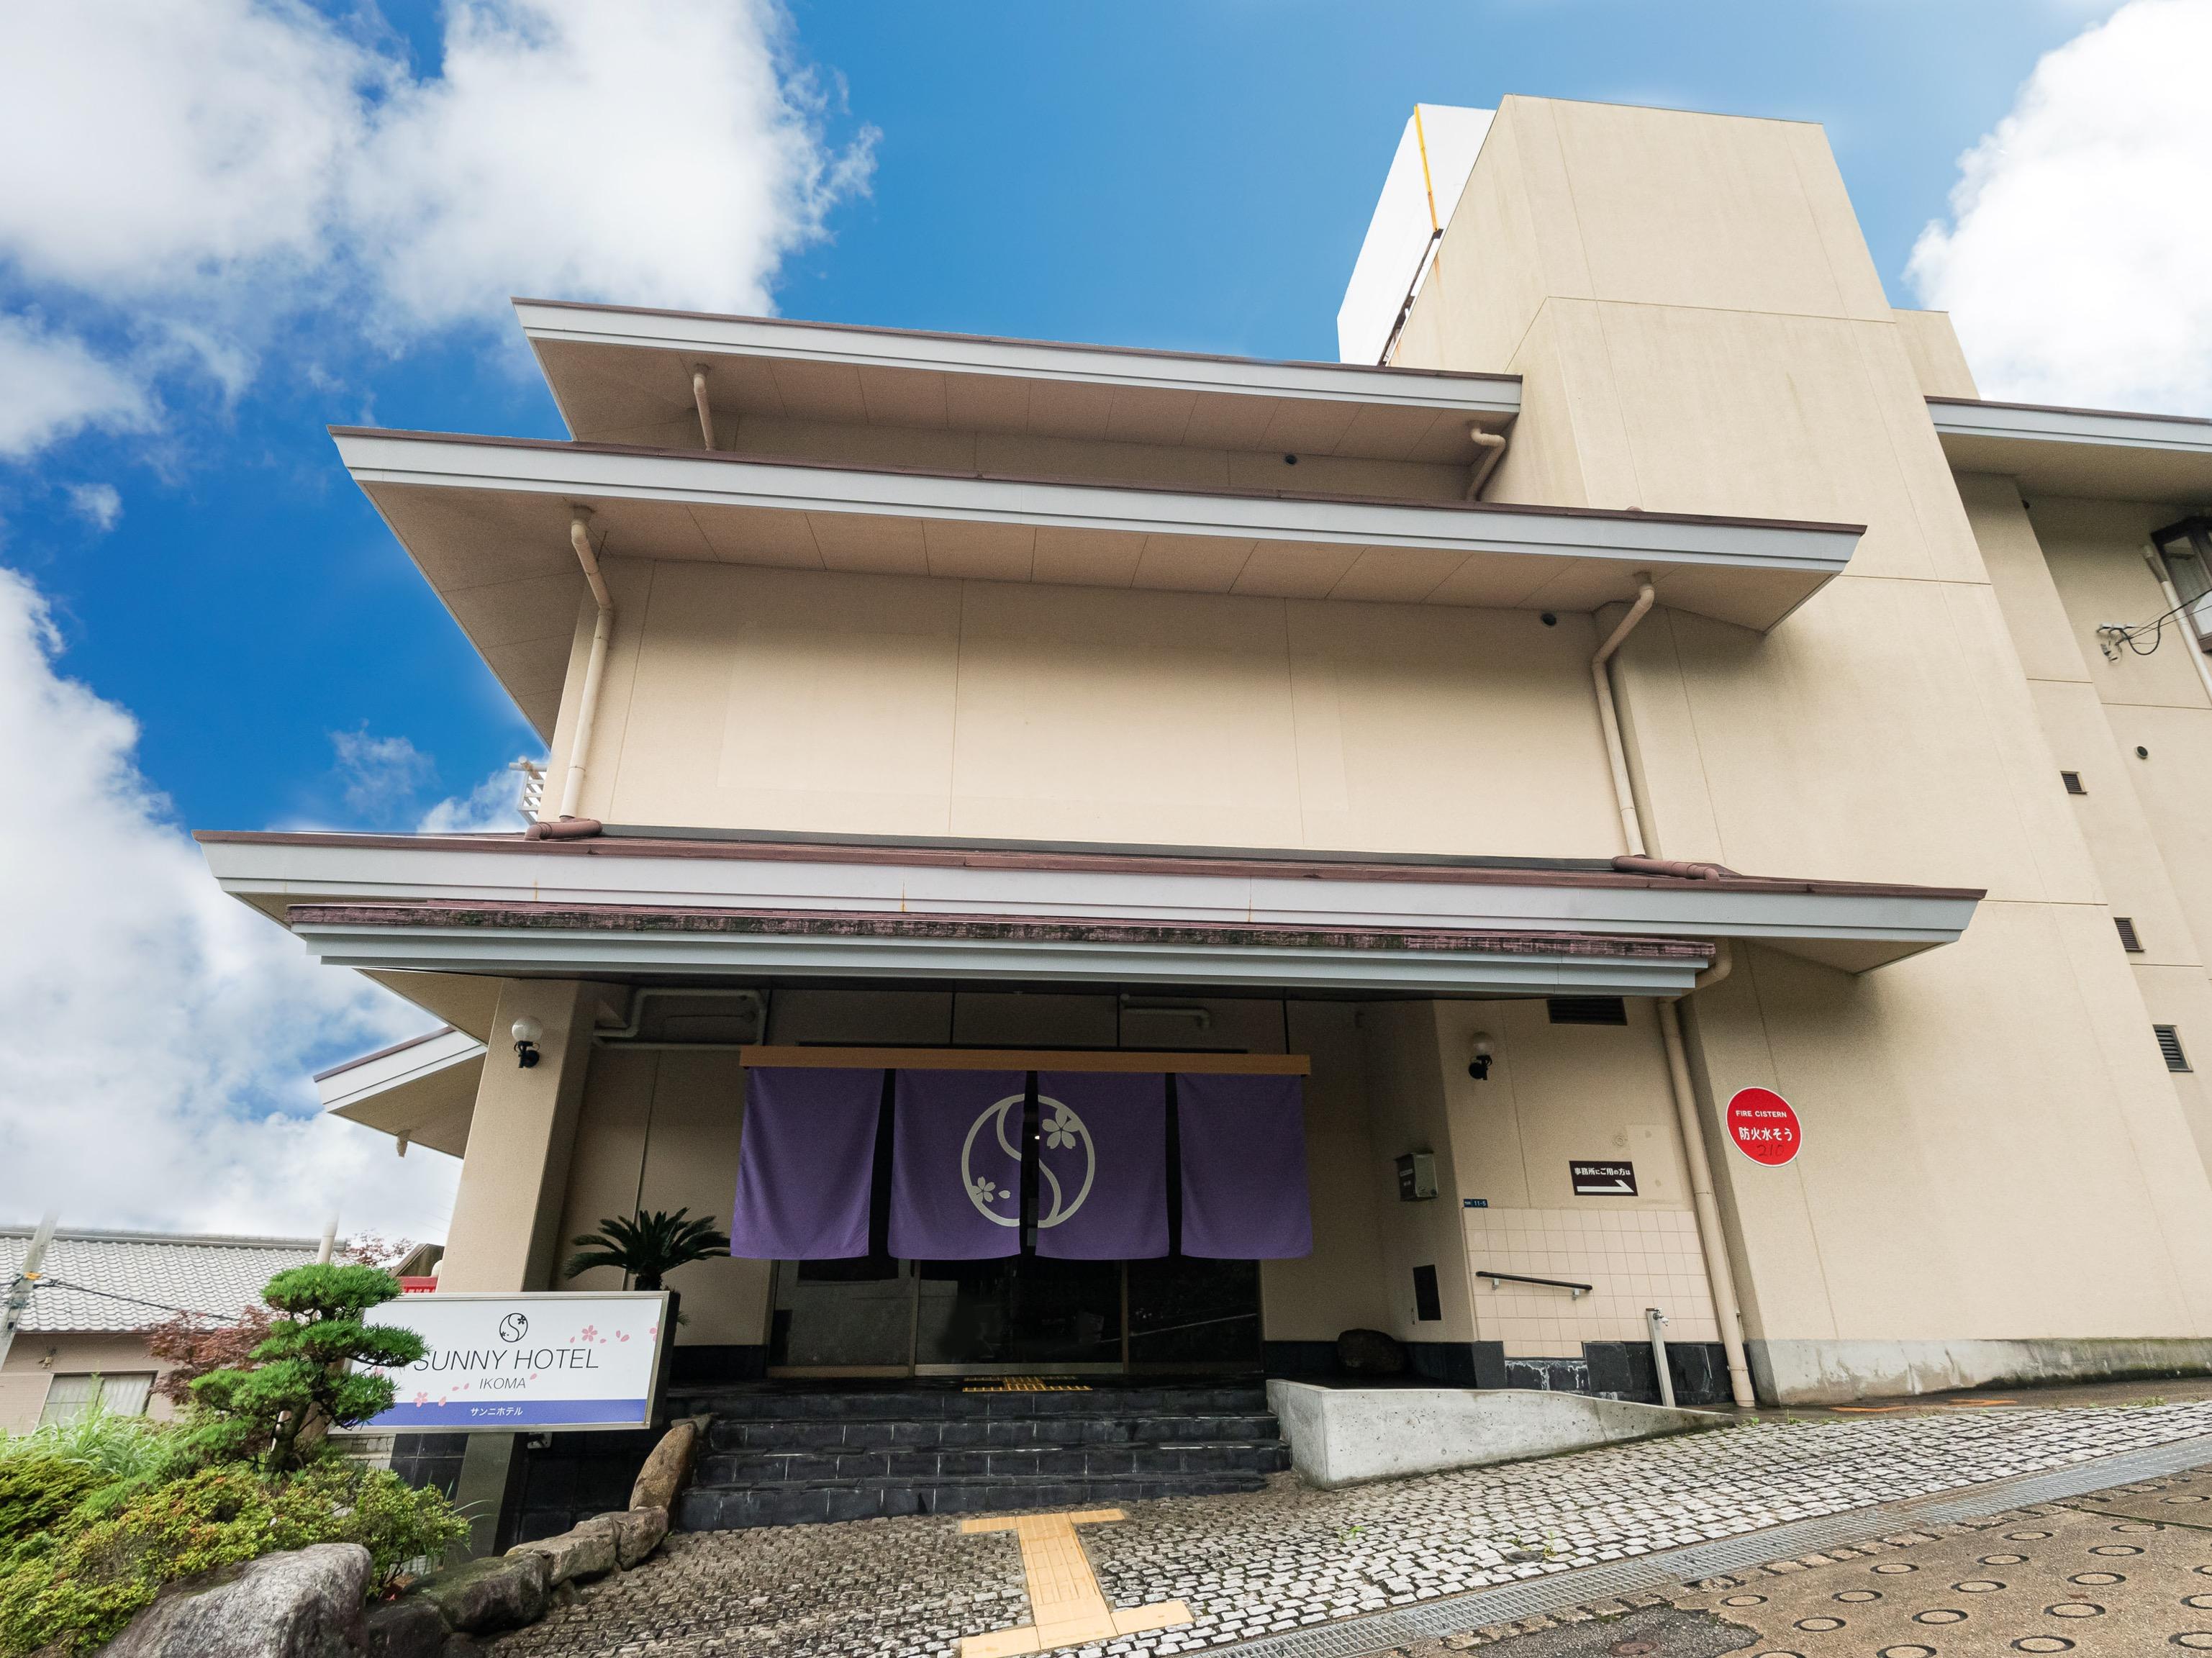 OYO サンニ旅館 奈良生駒